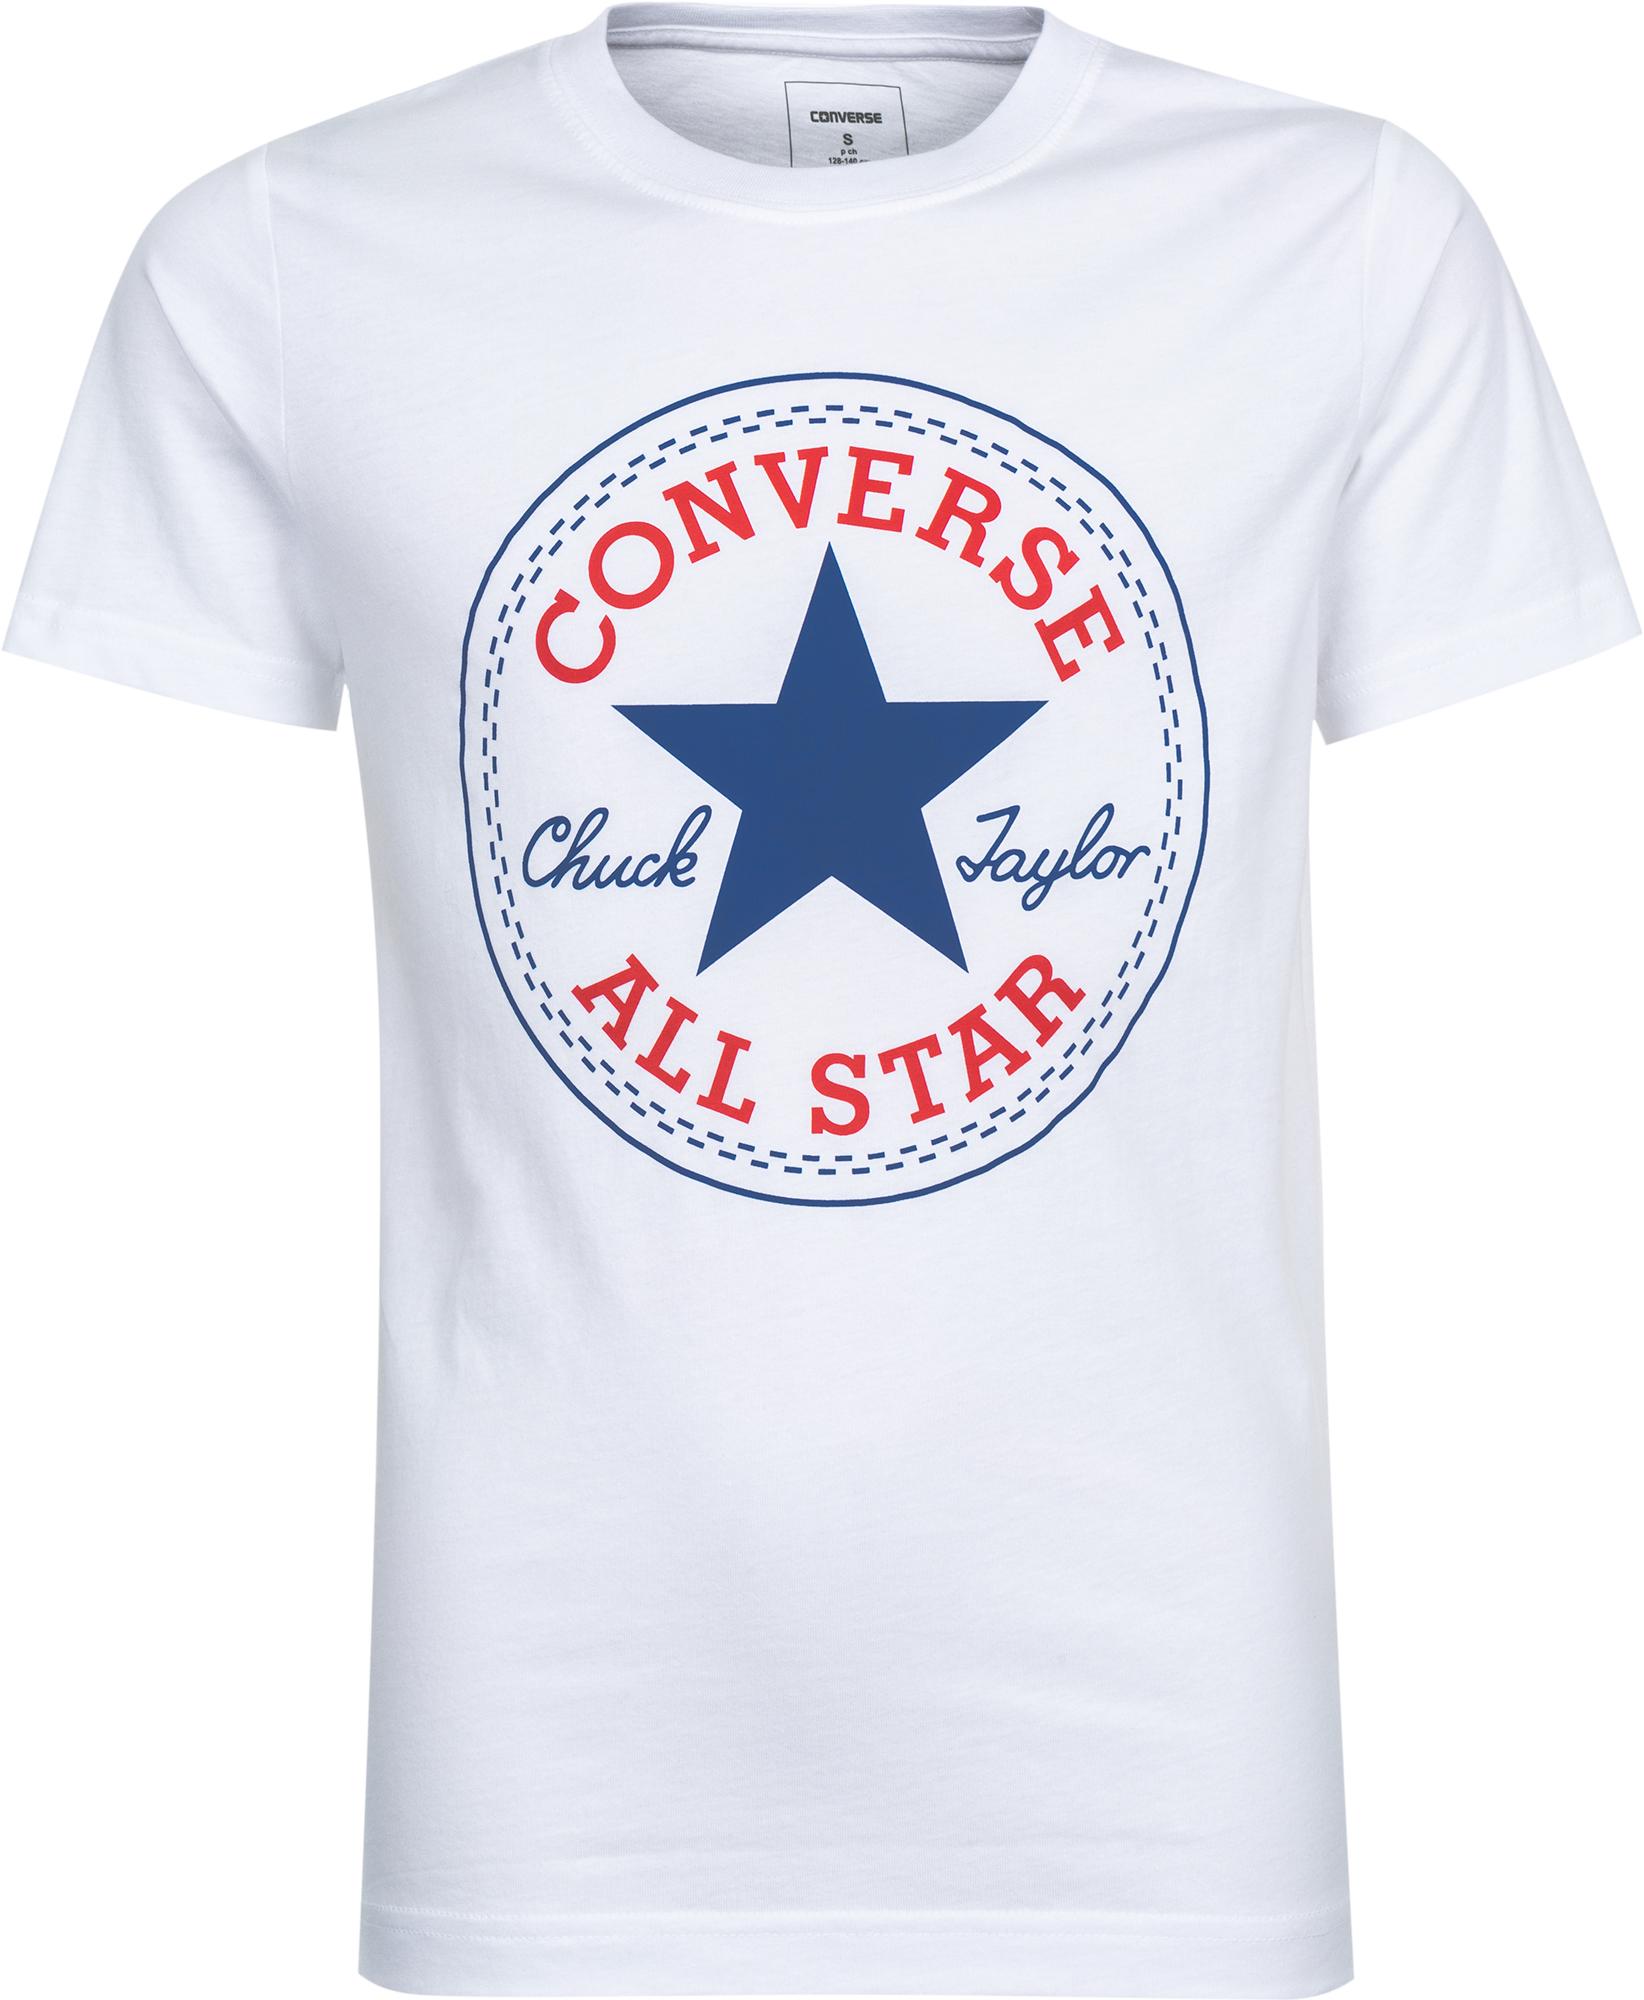 Converse Футболка для мальчиков Converse, размер 164